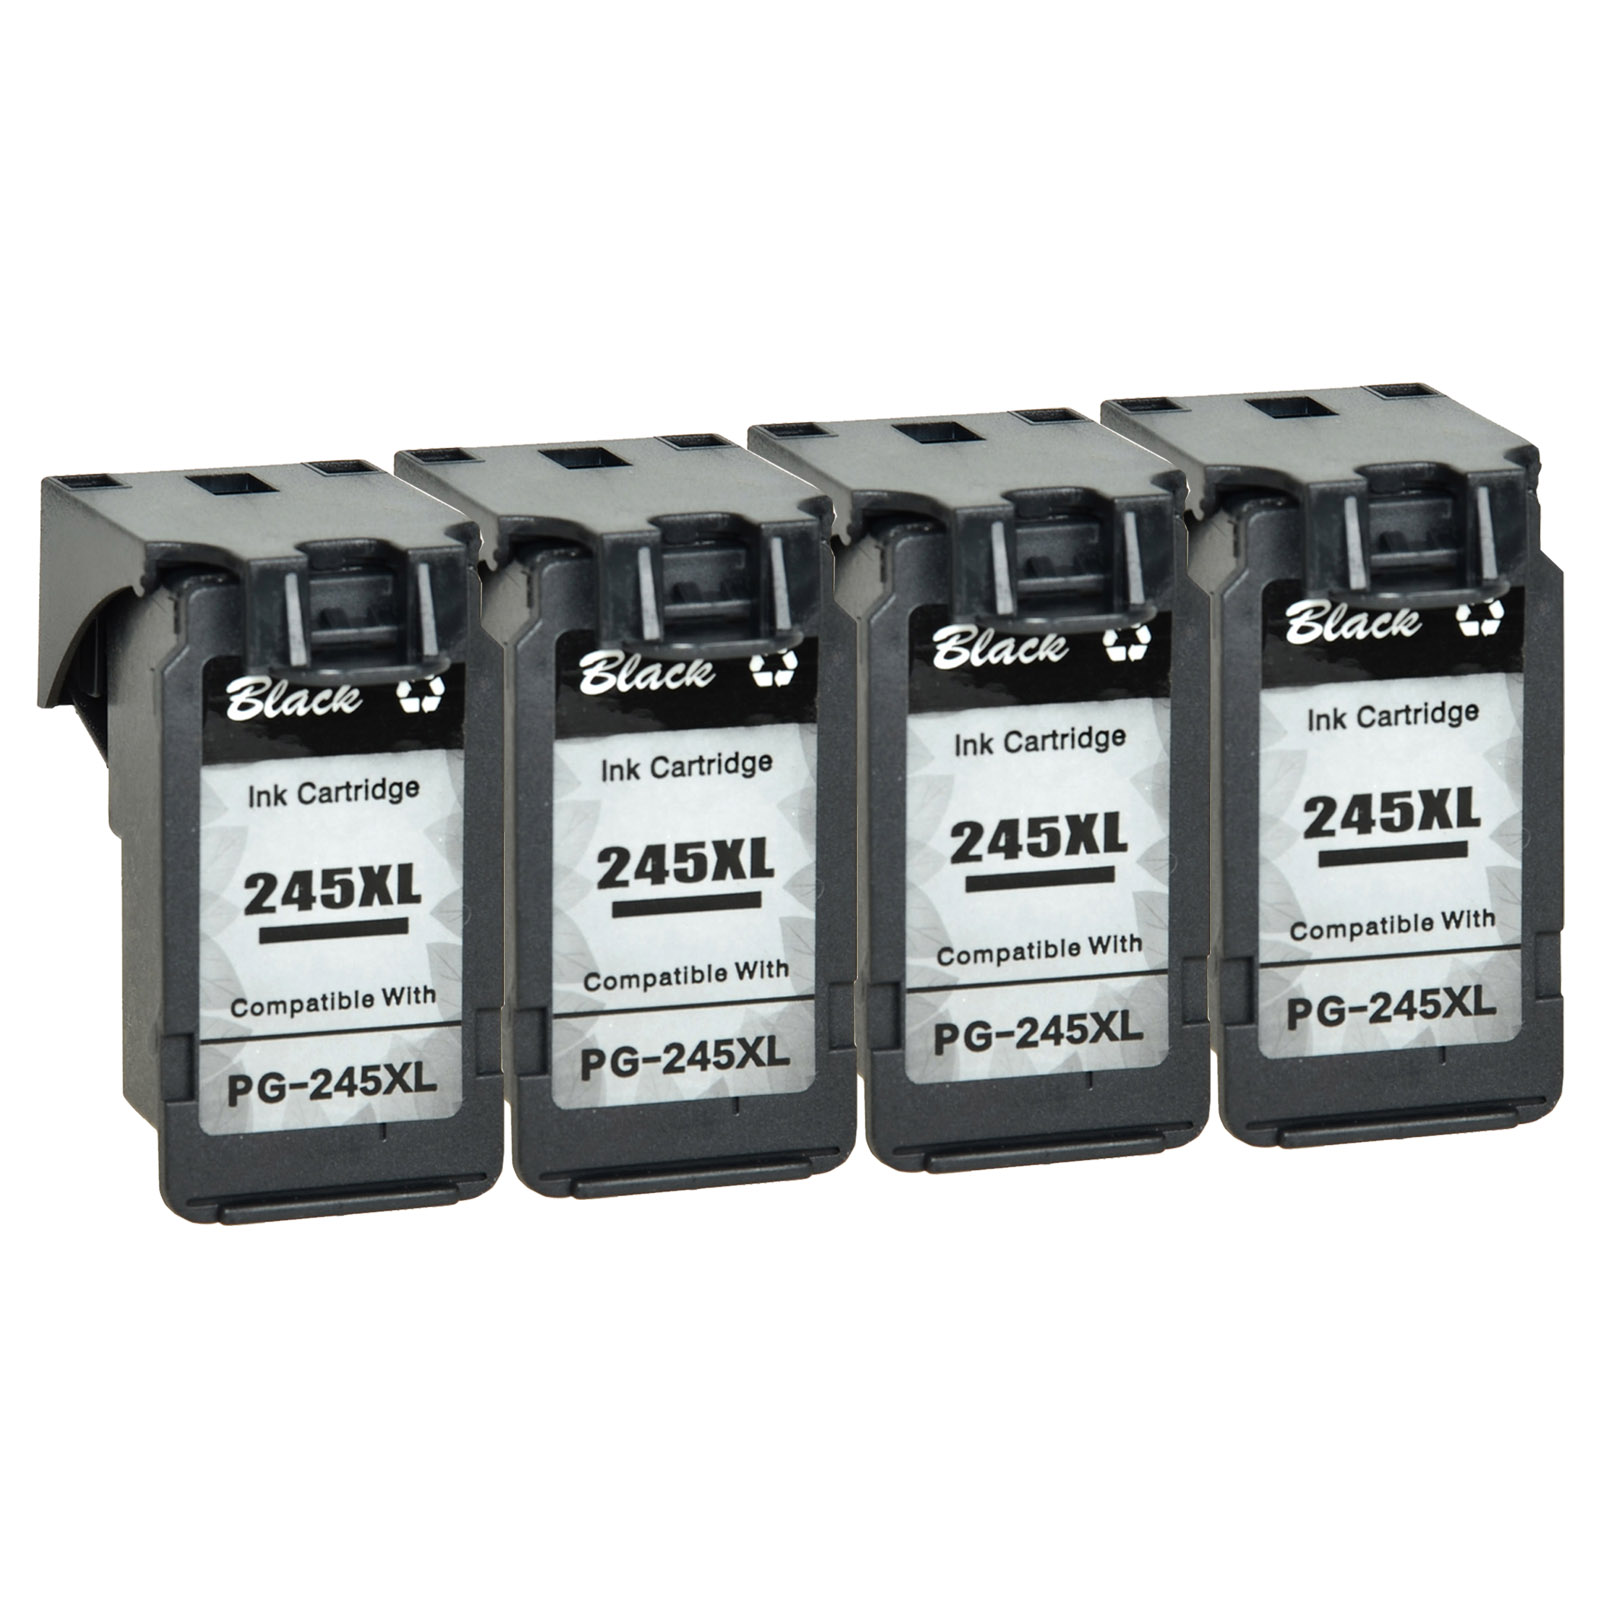 5 PK PG-245 XL PG245XL Black Ink Cartridge for Canon PIXMA IP2820 MX492 Printer